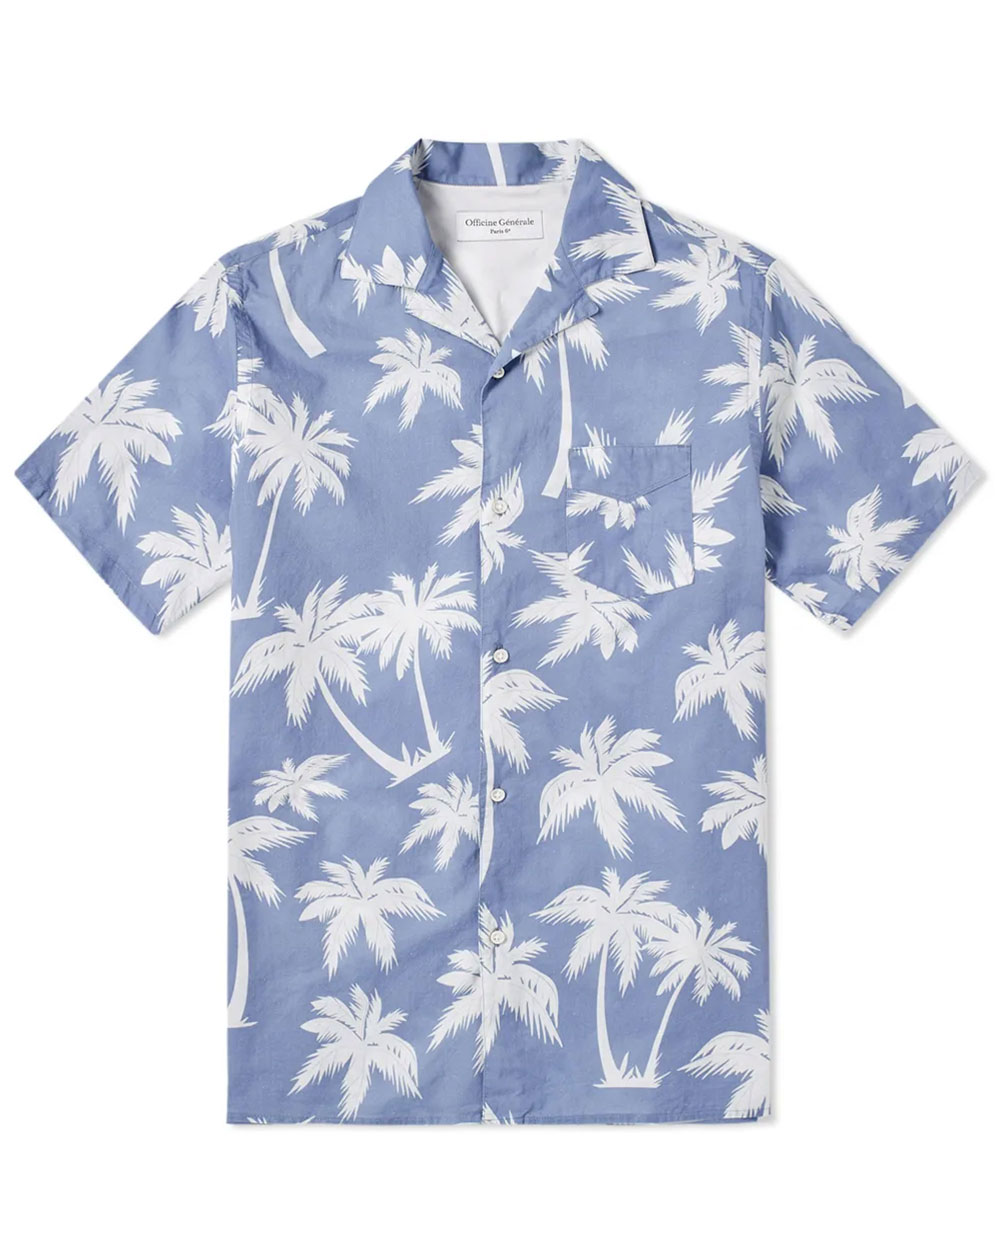 Officine Generale Dario Palm Print Short Sleeve Shirt